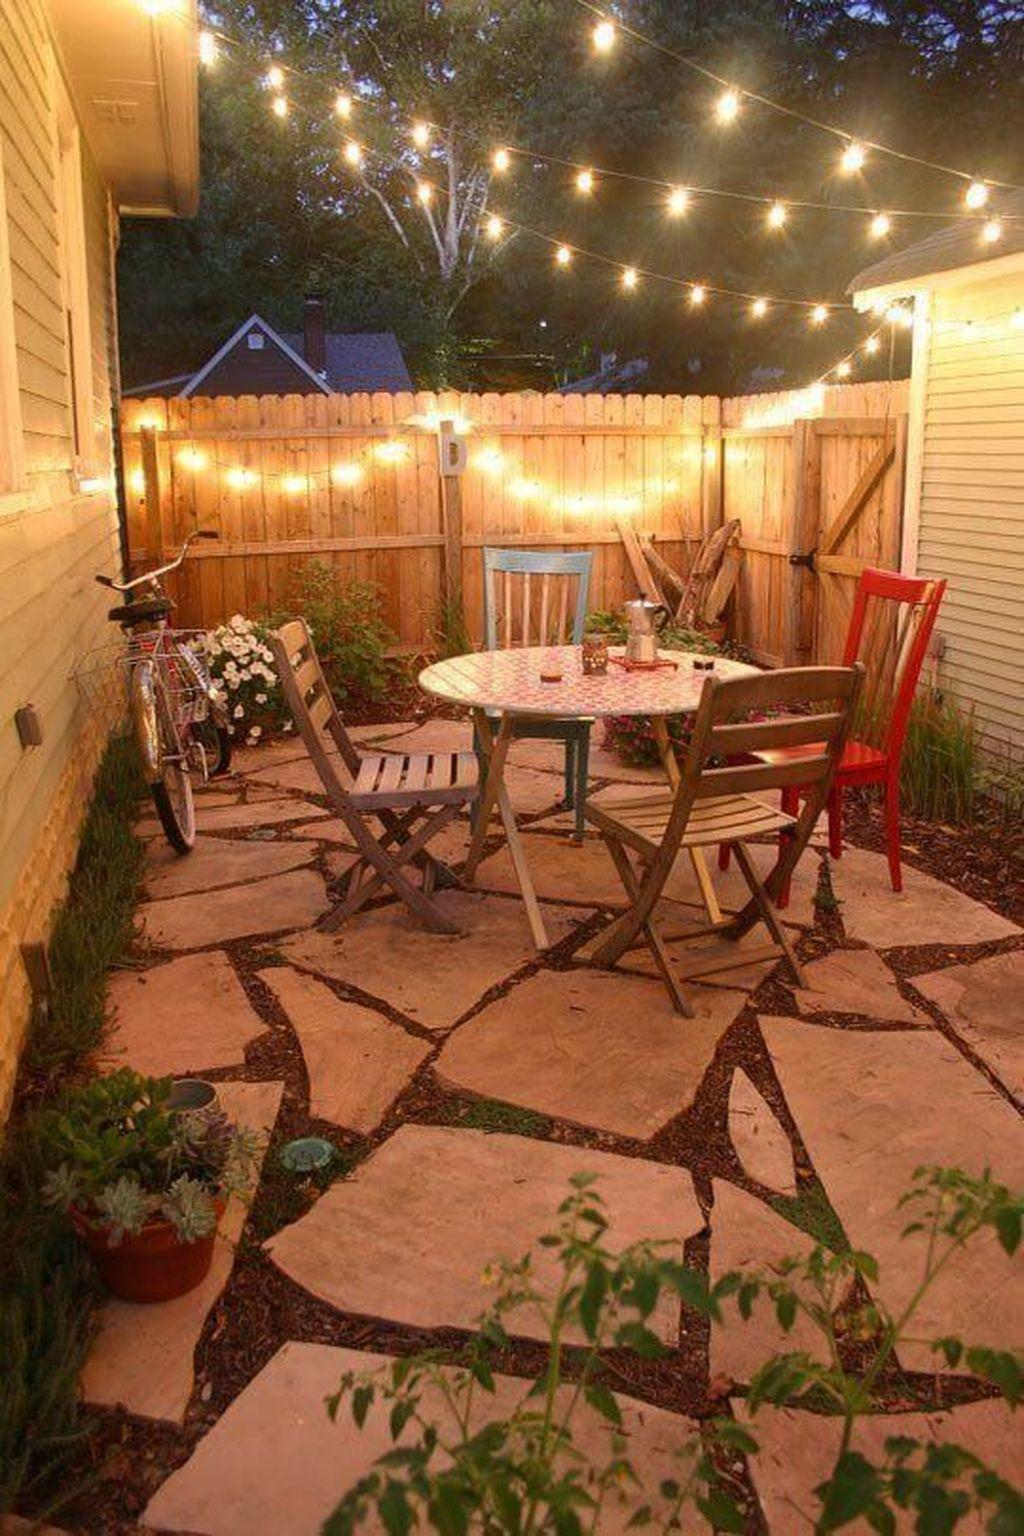 The Best Romantic Backyard Decorating Ideas 19